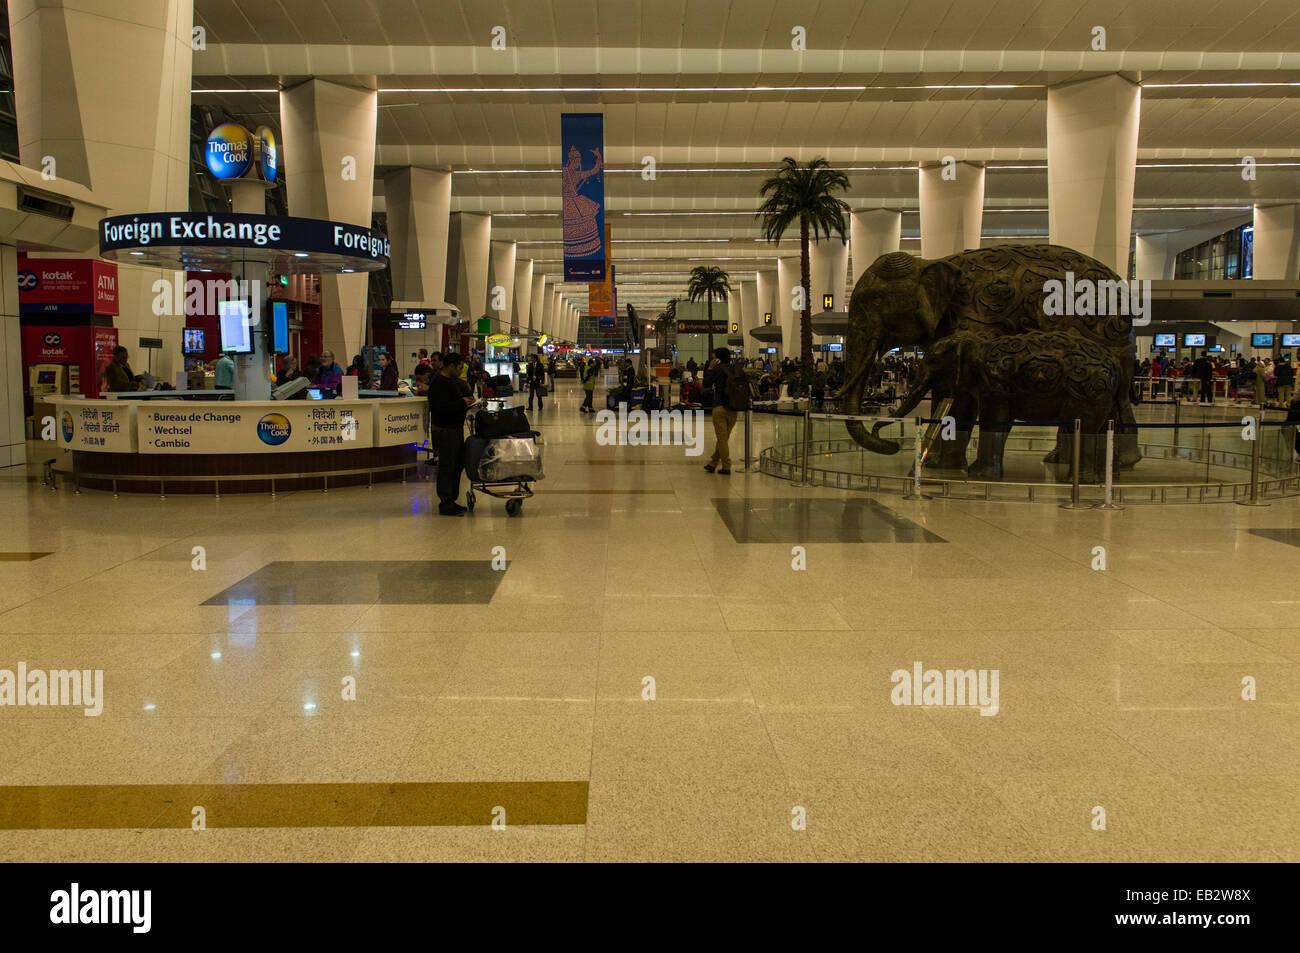 indira gandhi international airport interior view new. Black Bedroom Furniture Sets. Home Design Ideas